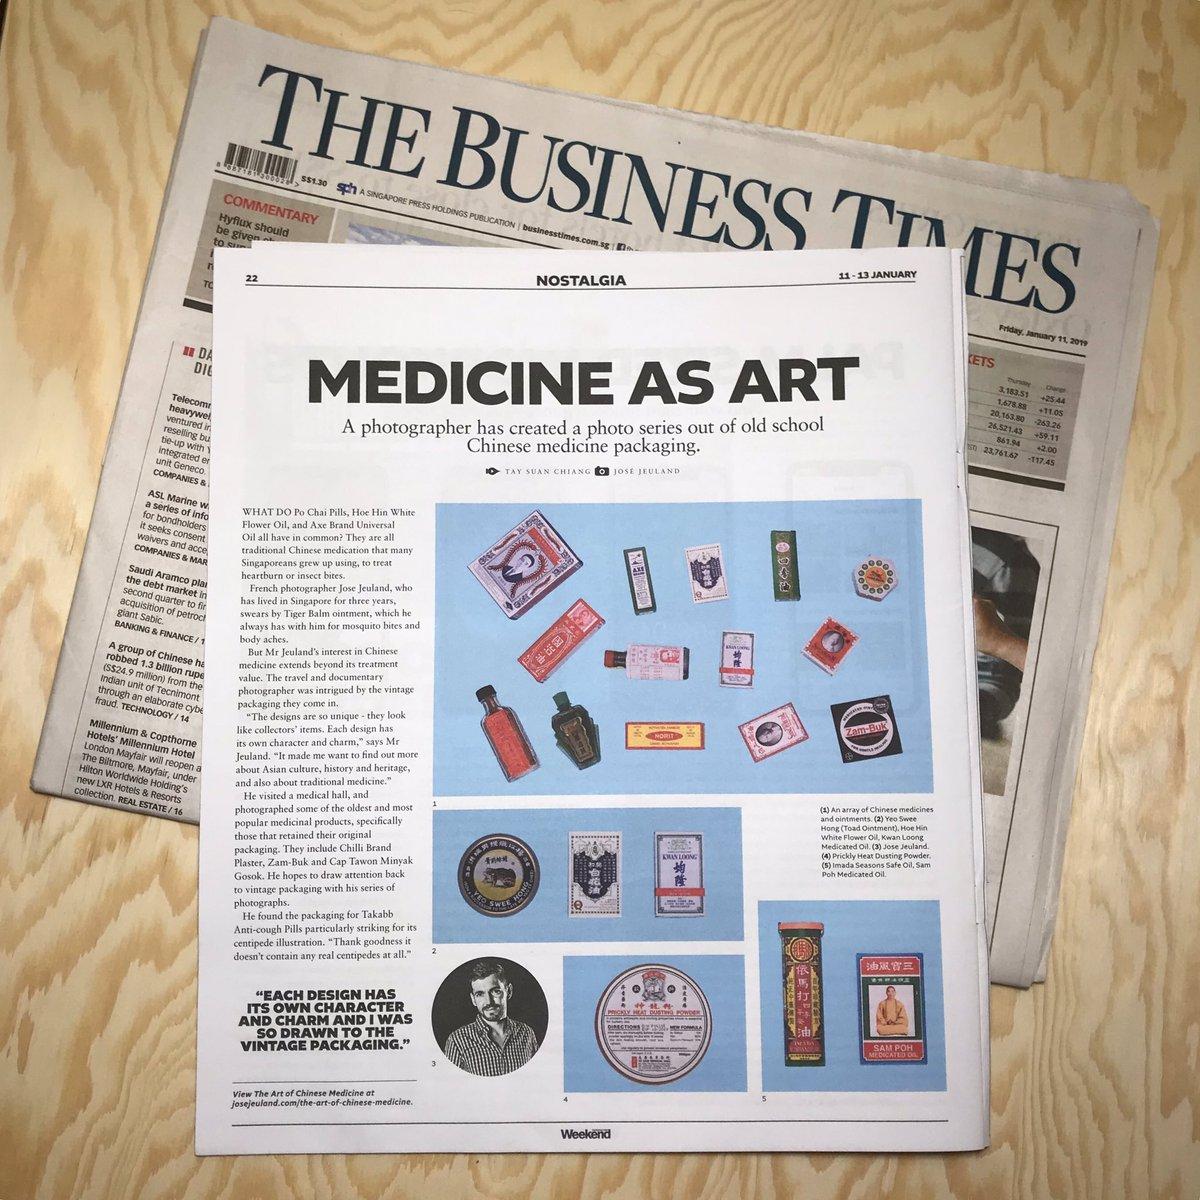 Art of Chinese medicine - The Business Times weekend Singapore Jose Jeuland Photographer newspaper